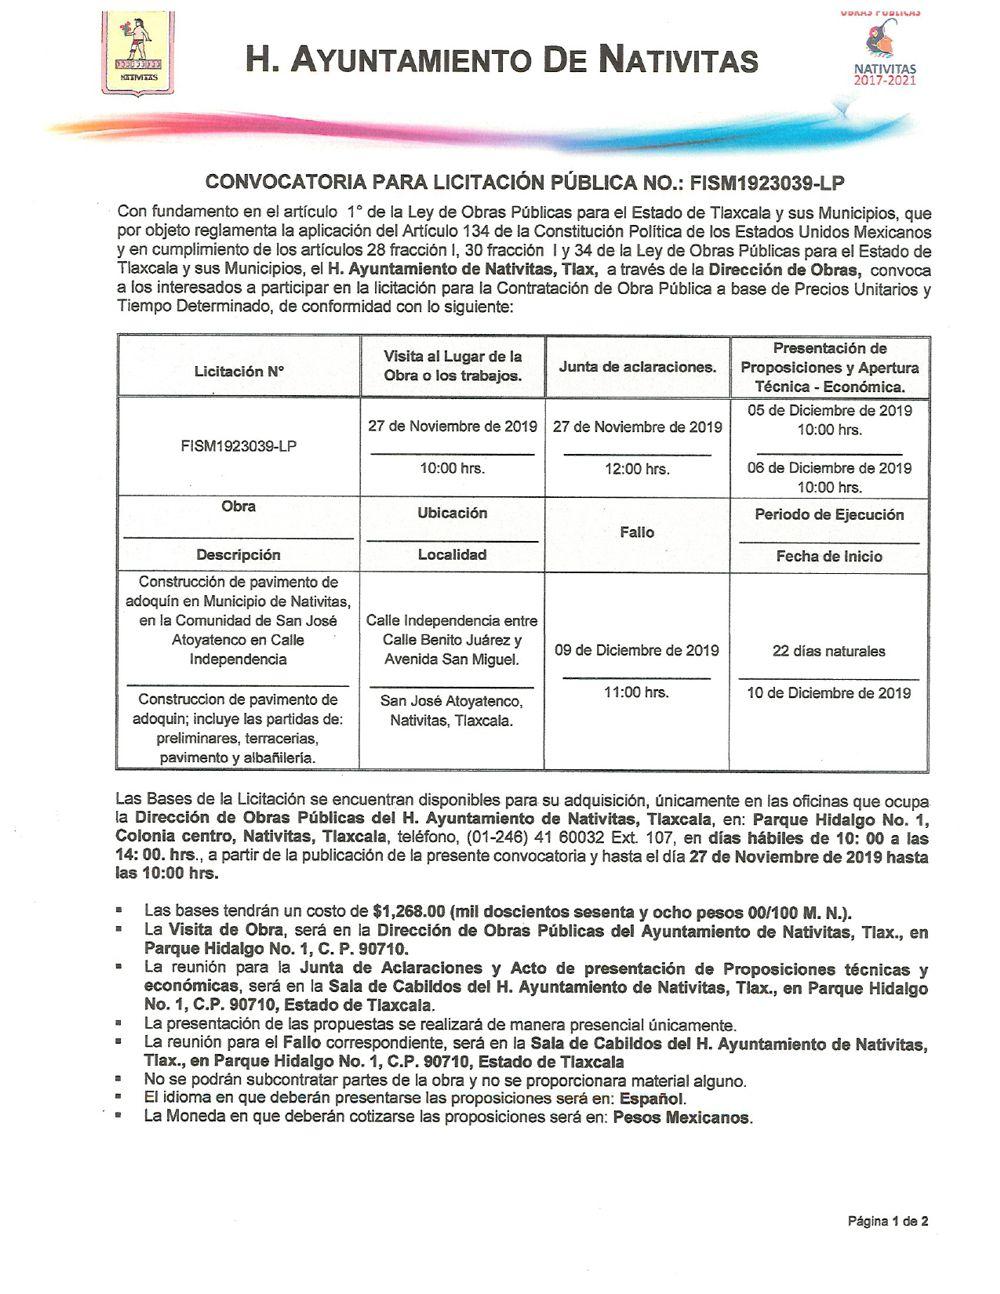 Convocatoria para licitación pública No. FISM1923039-LP de Natvitas